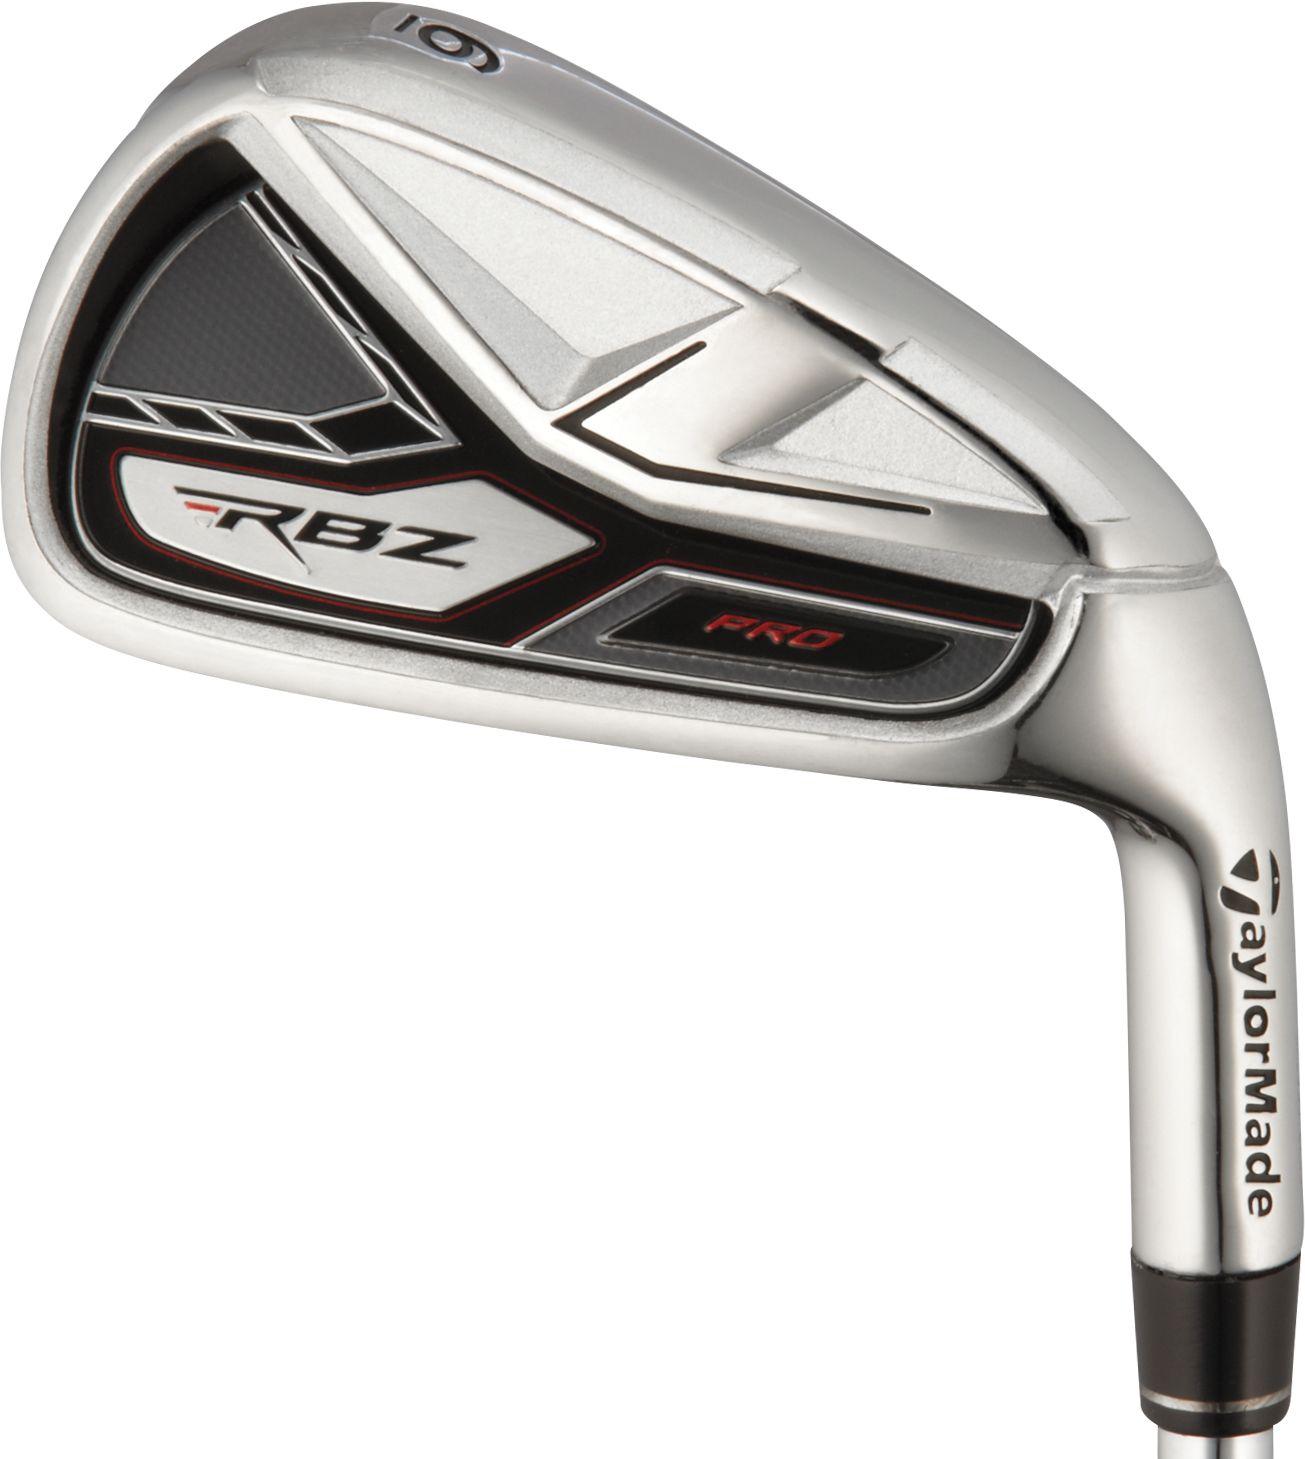 Taylormade Rbz Pro Irons Steel Golf Galaxy